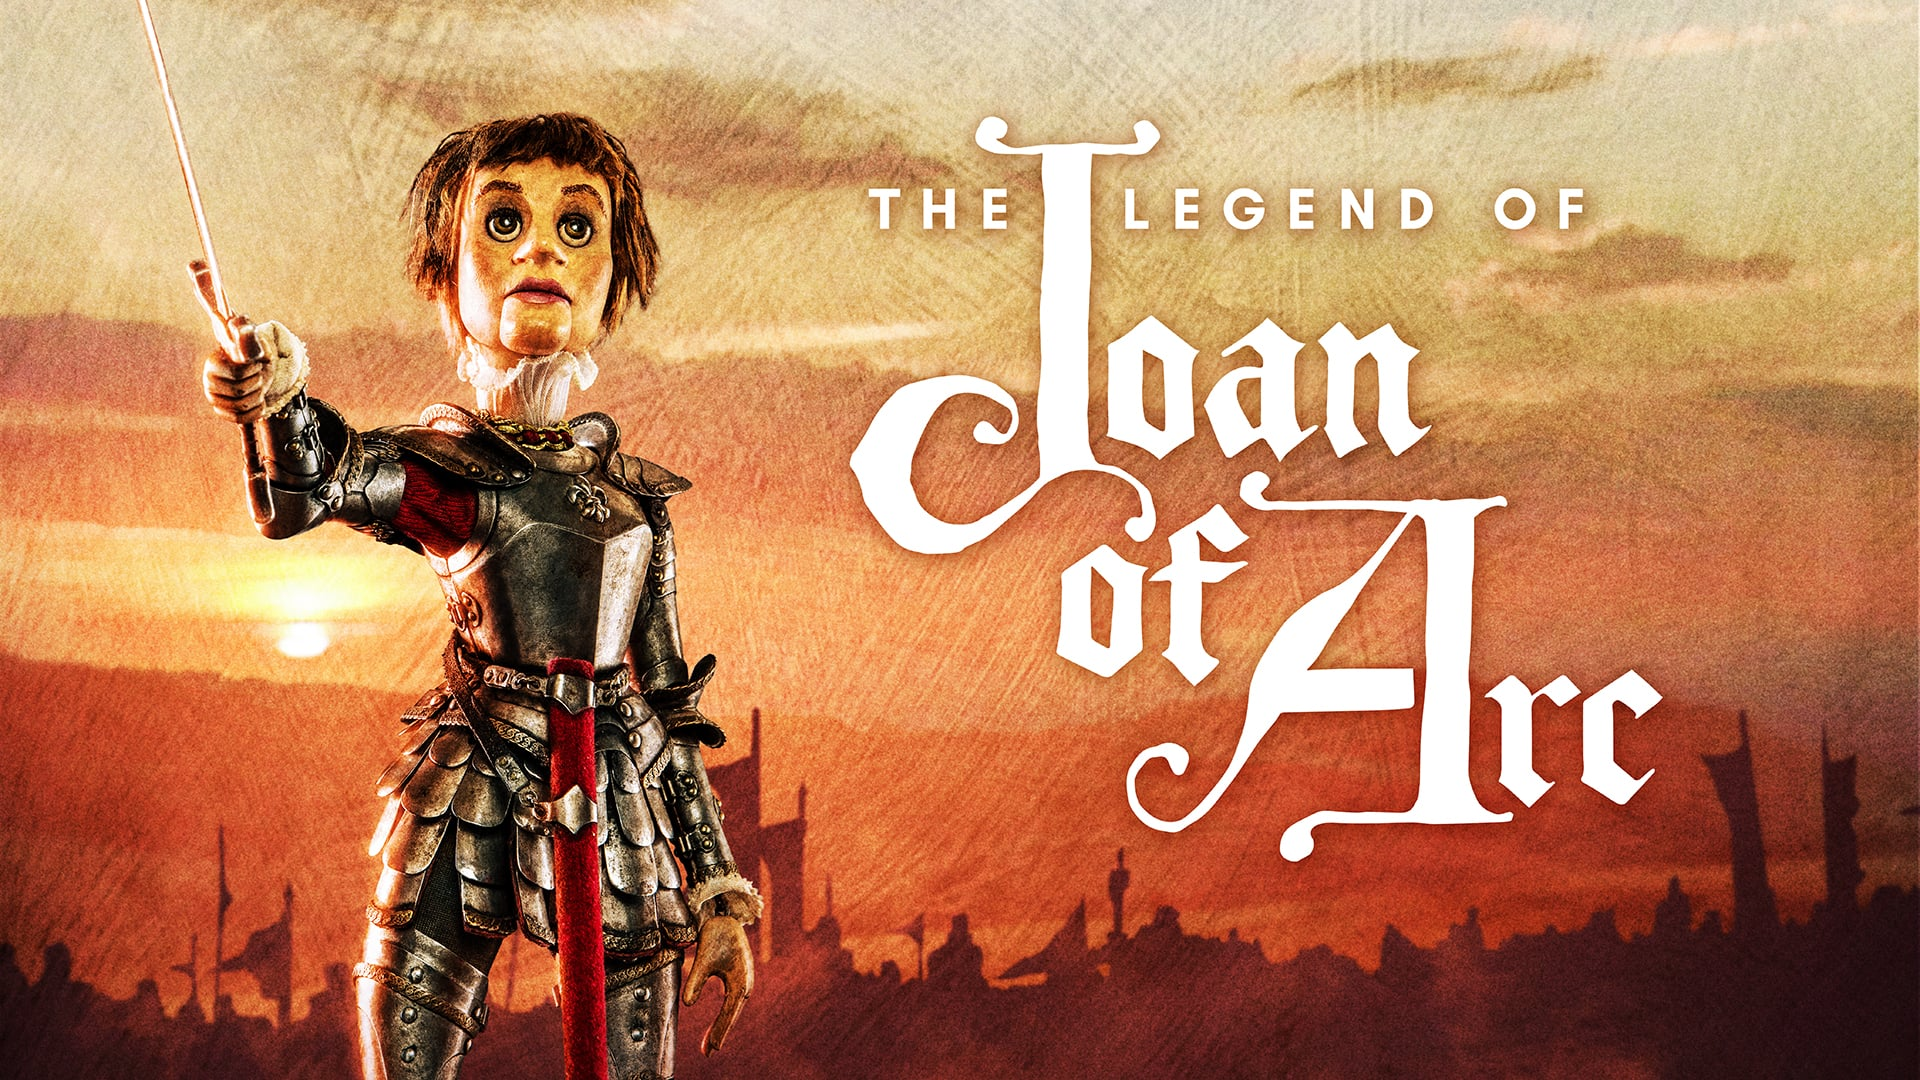 The Legend of Joan of Arc - Final Trailer